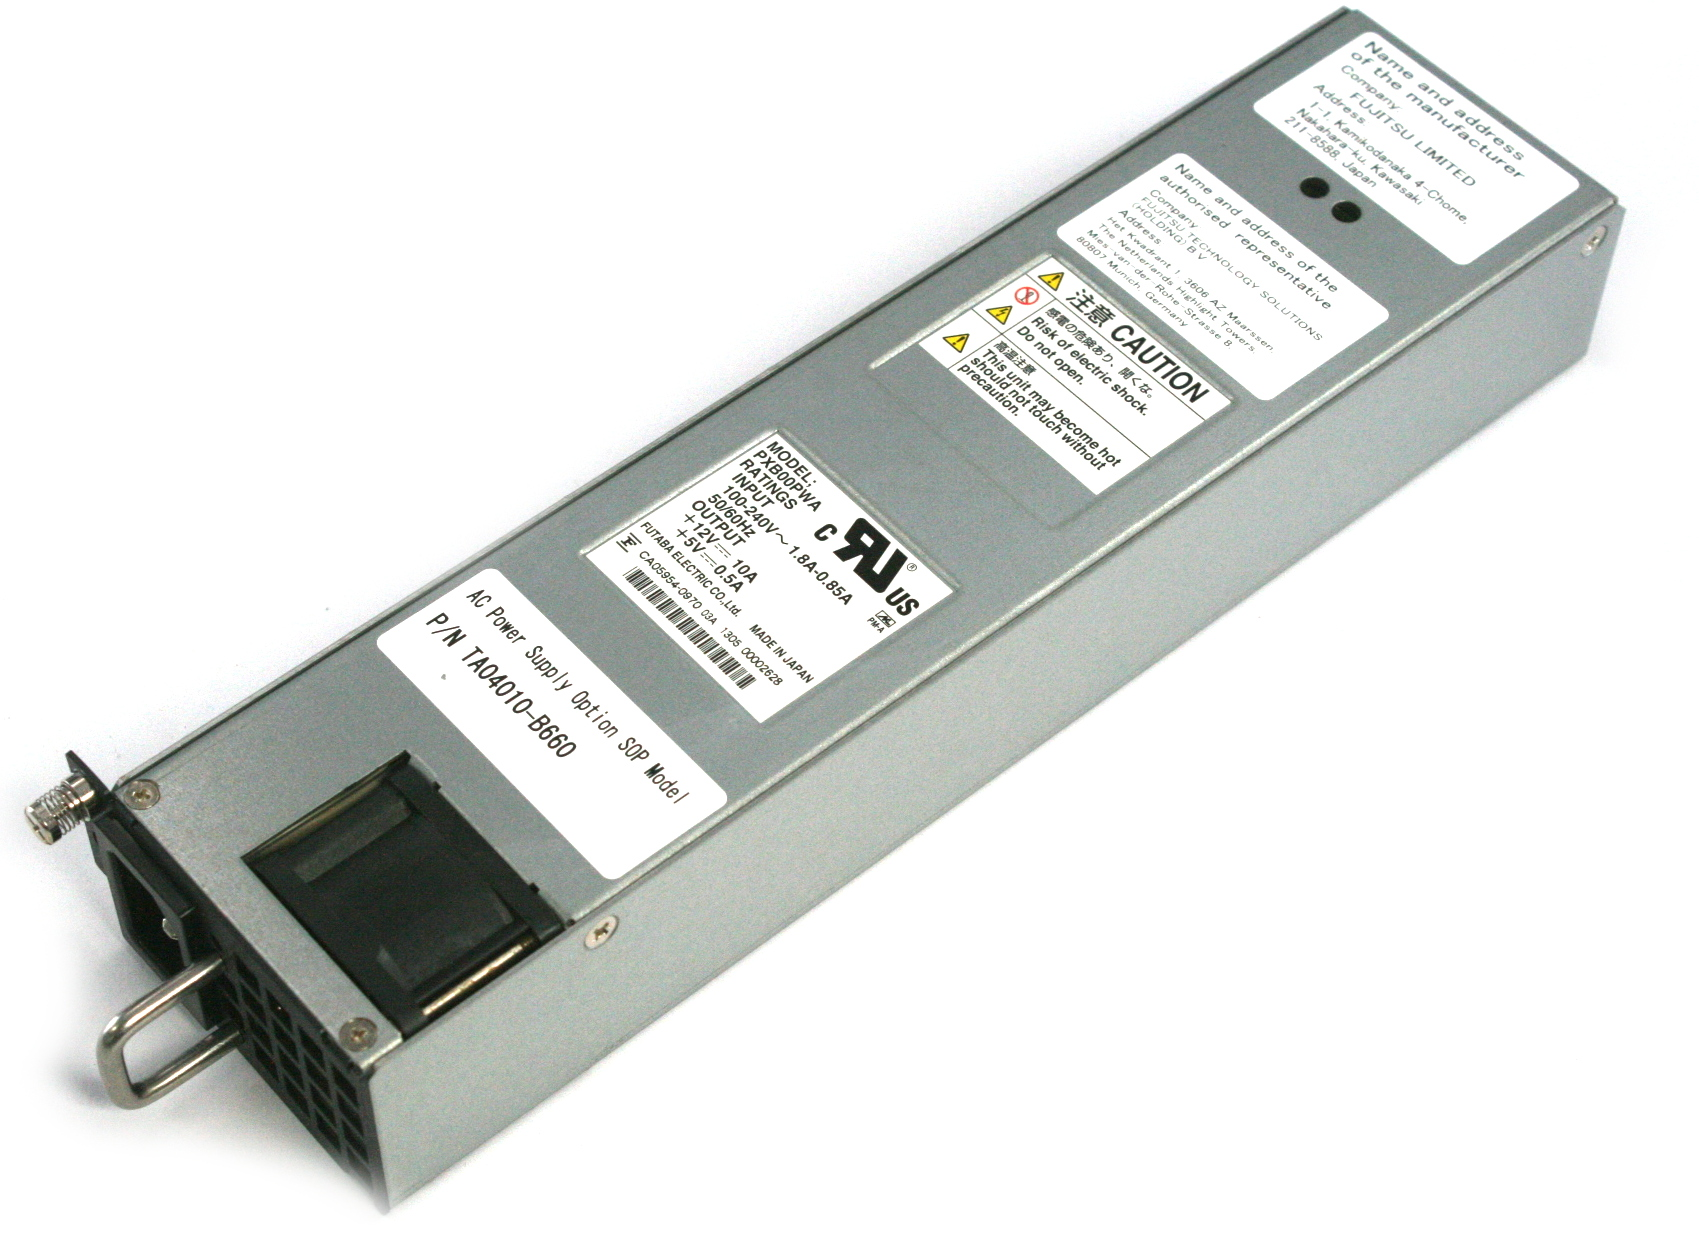 Fujitsu TA04010-B660 Server AC Power Supply Model:PXB00PWA